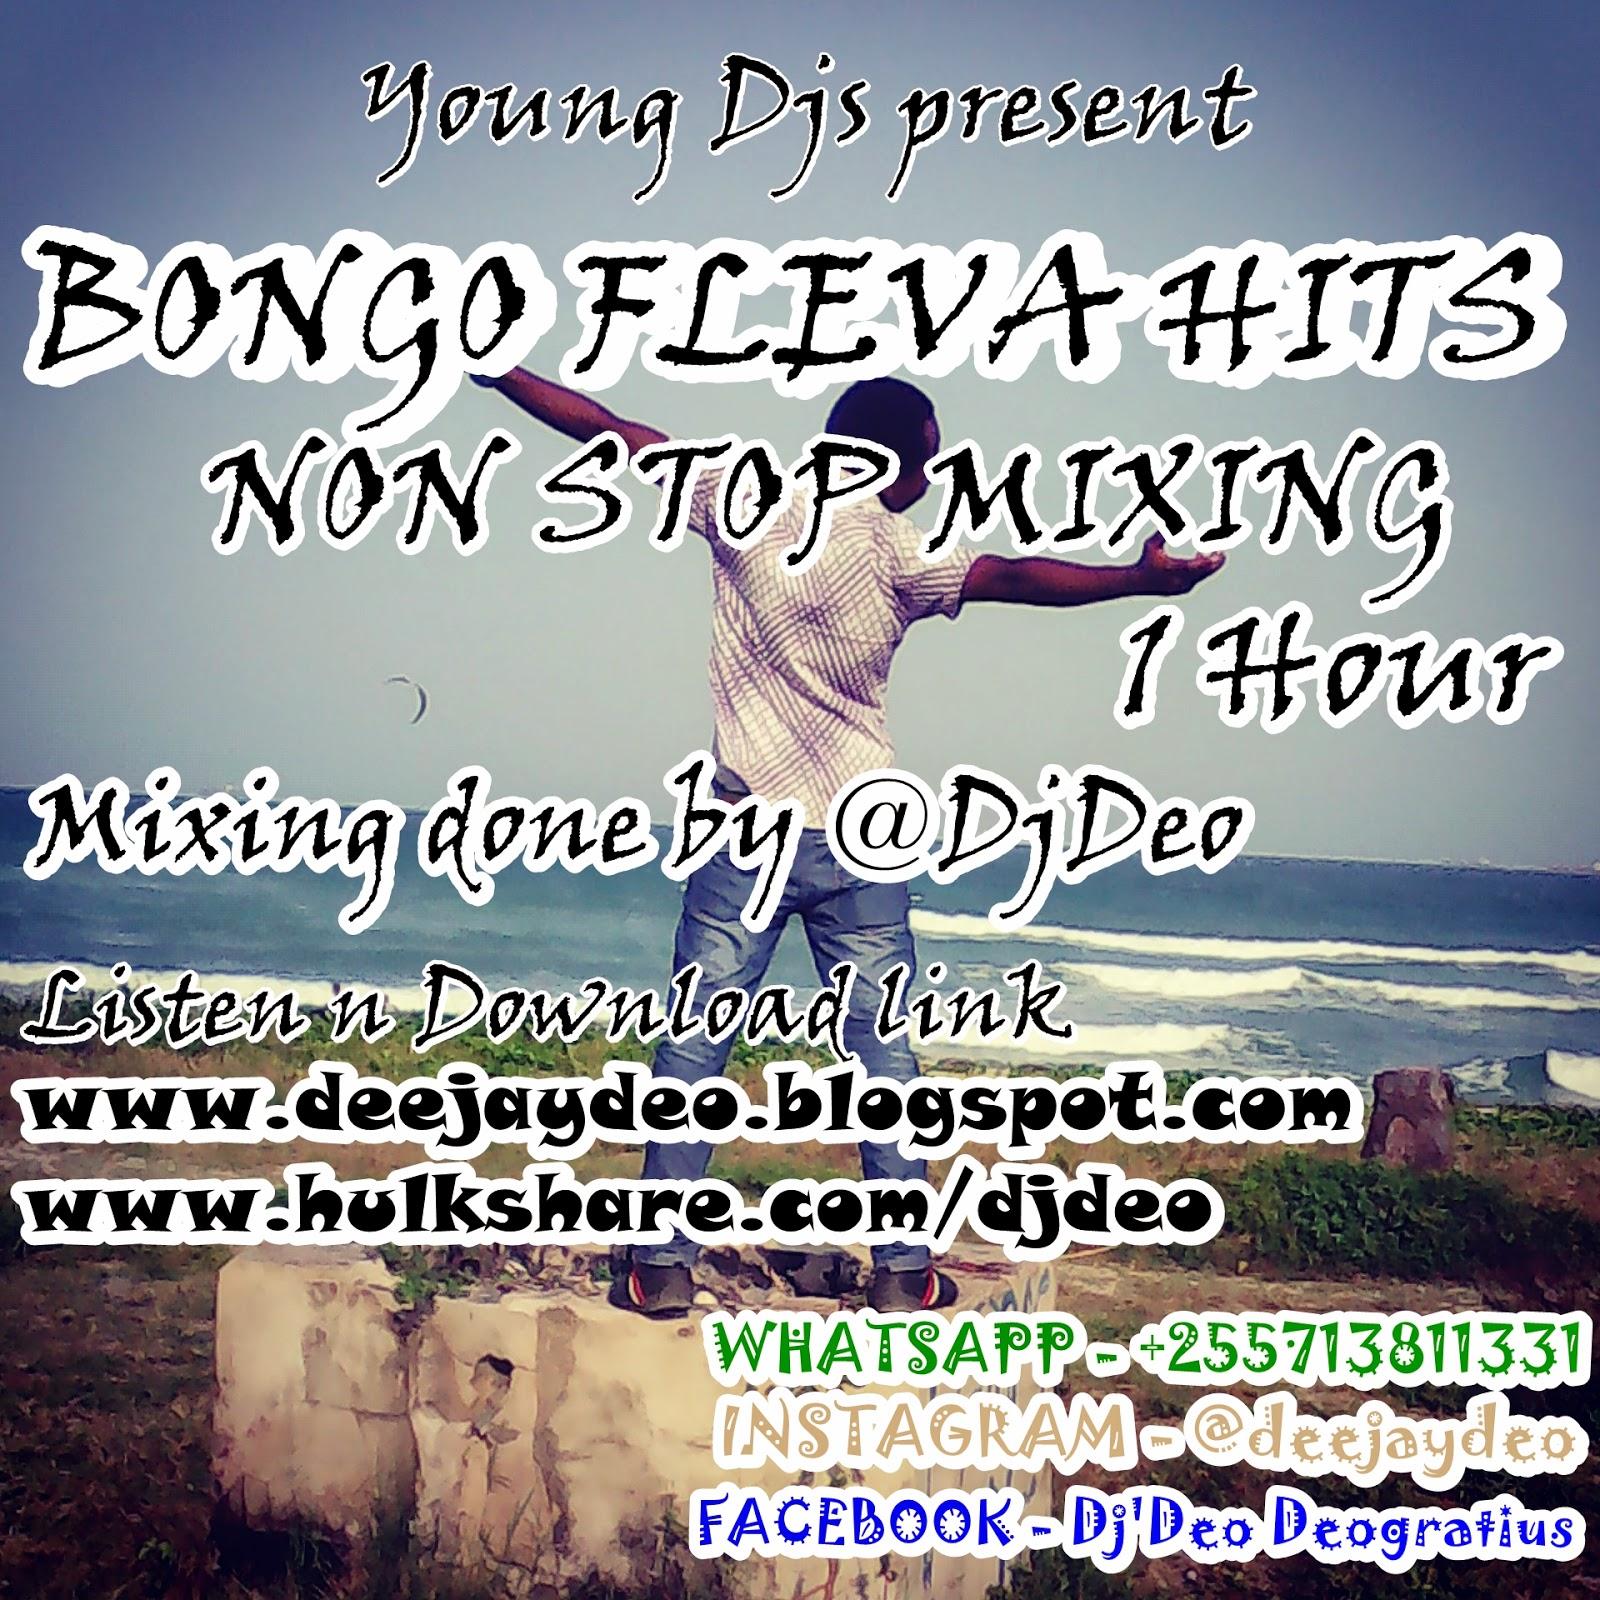 Audio - Dj Mixing) DjDeo - BONGO FLEVA OLD SKOOL NON STOP